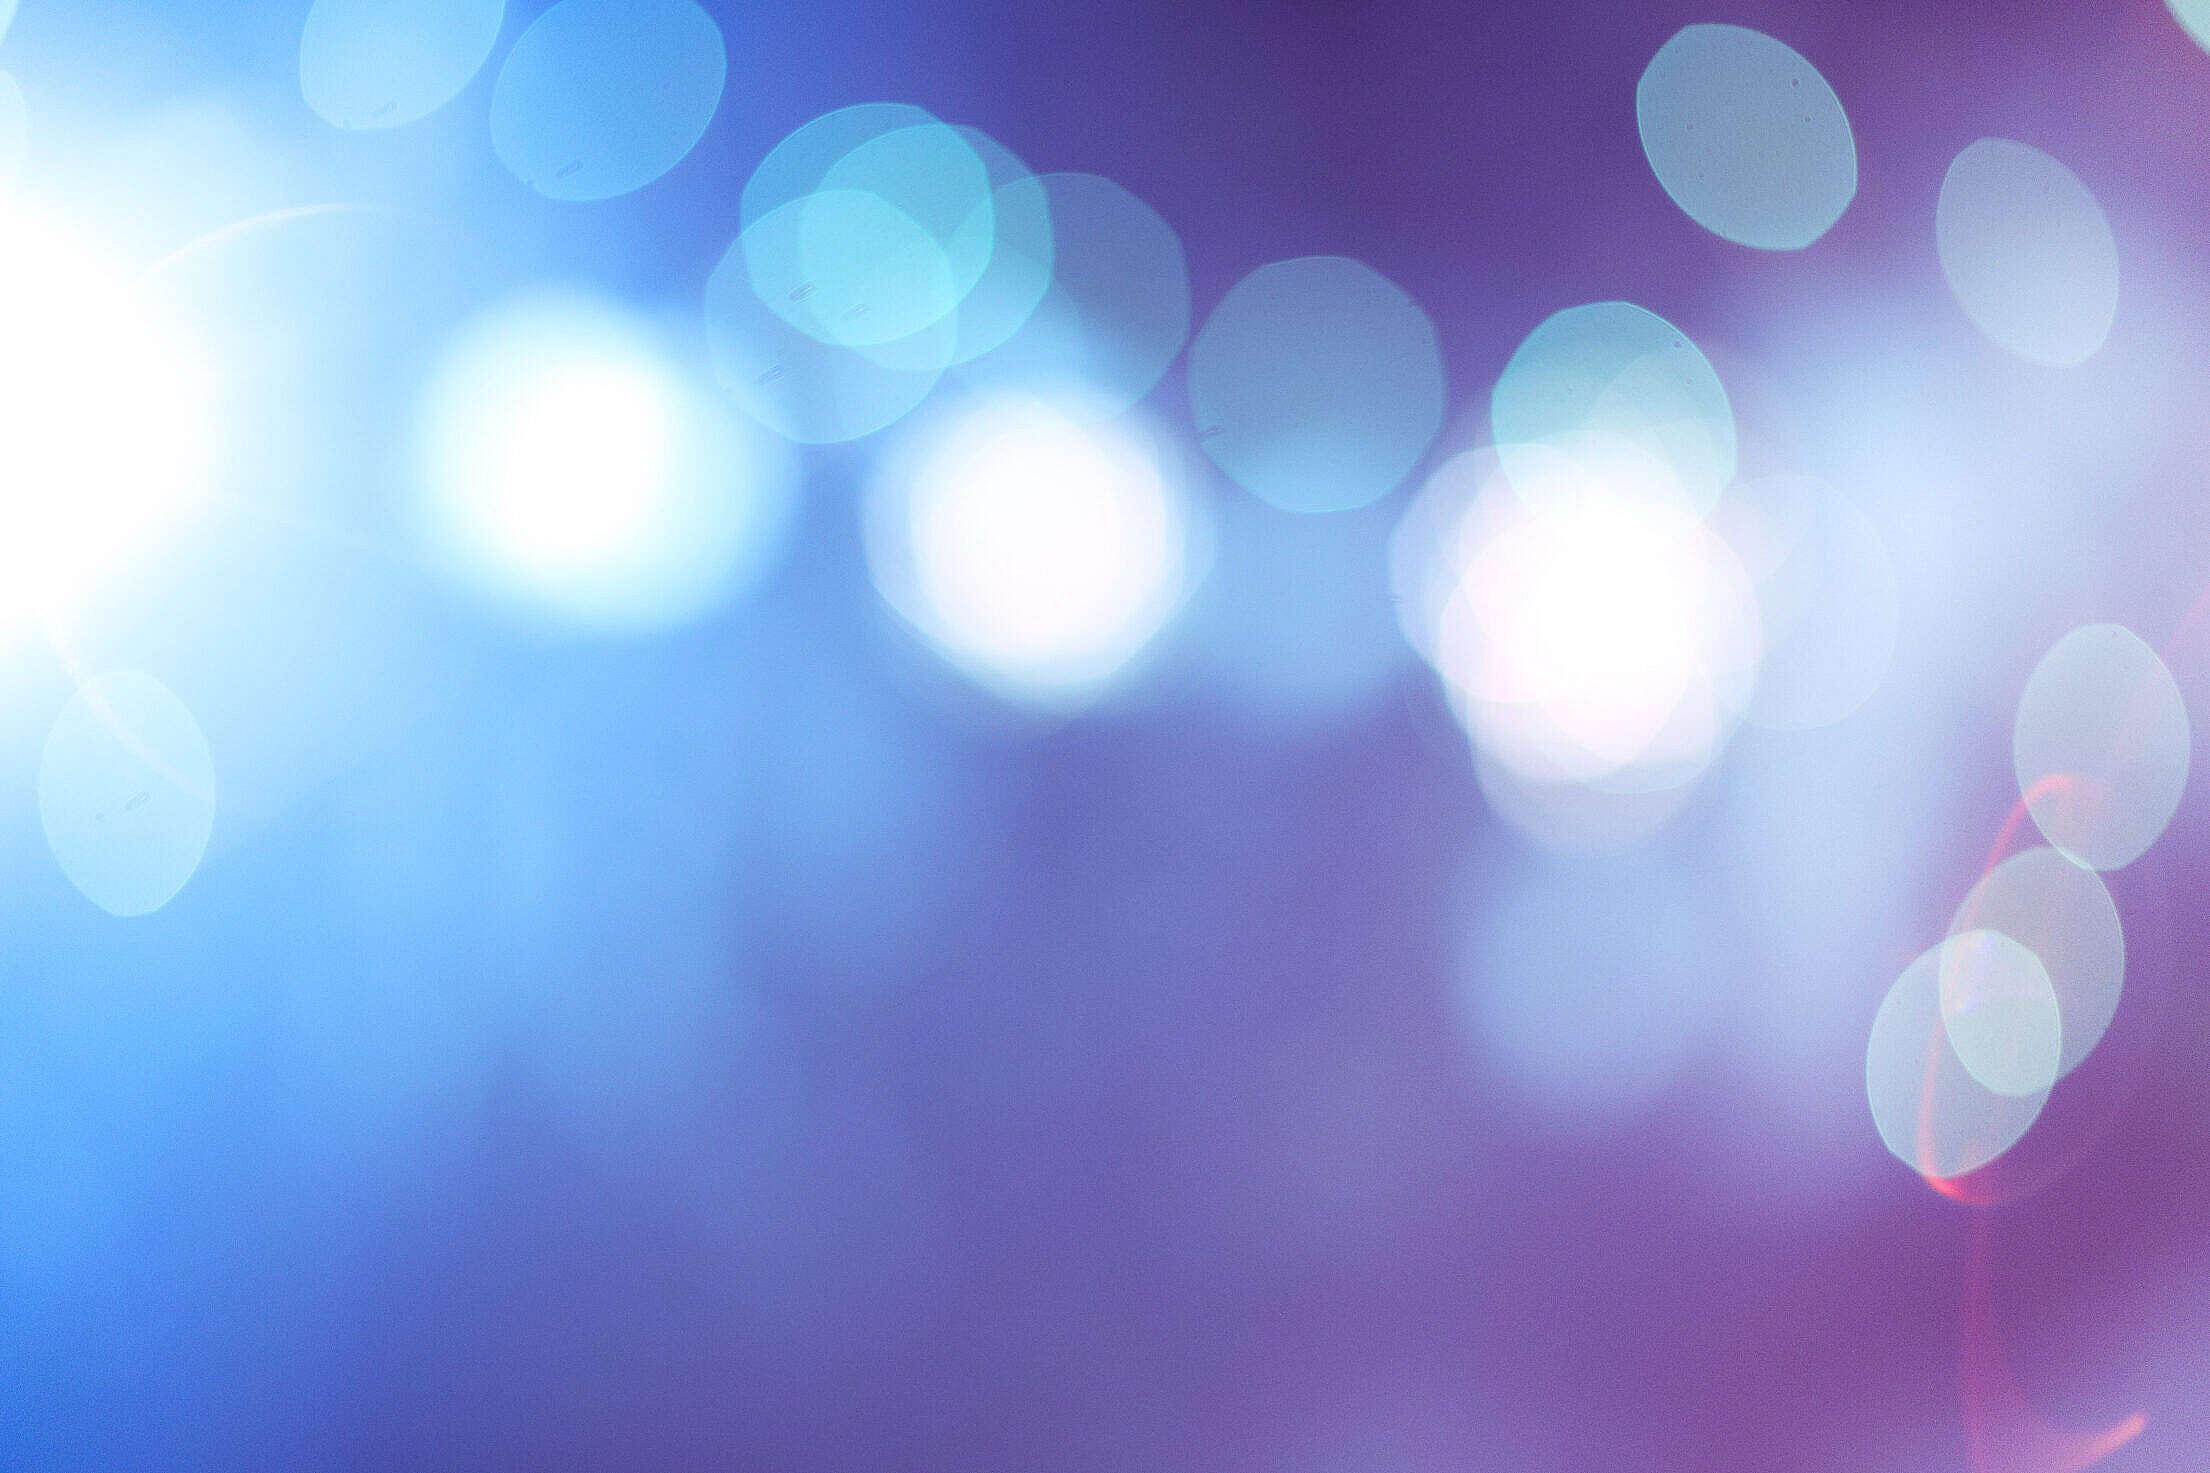 Blue Abstract Bokeh Lights Free Stock Photo